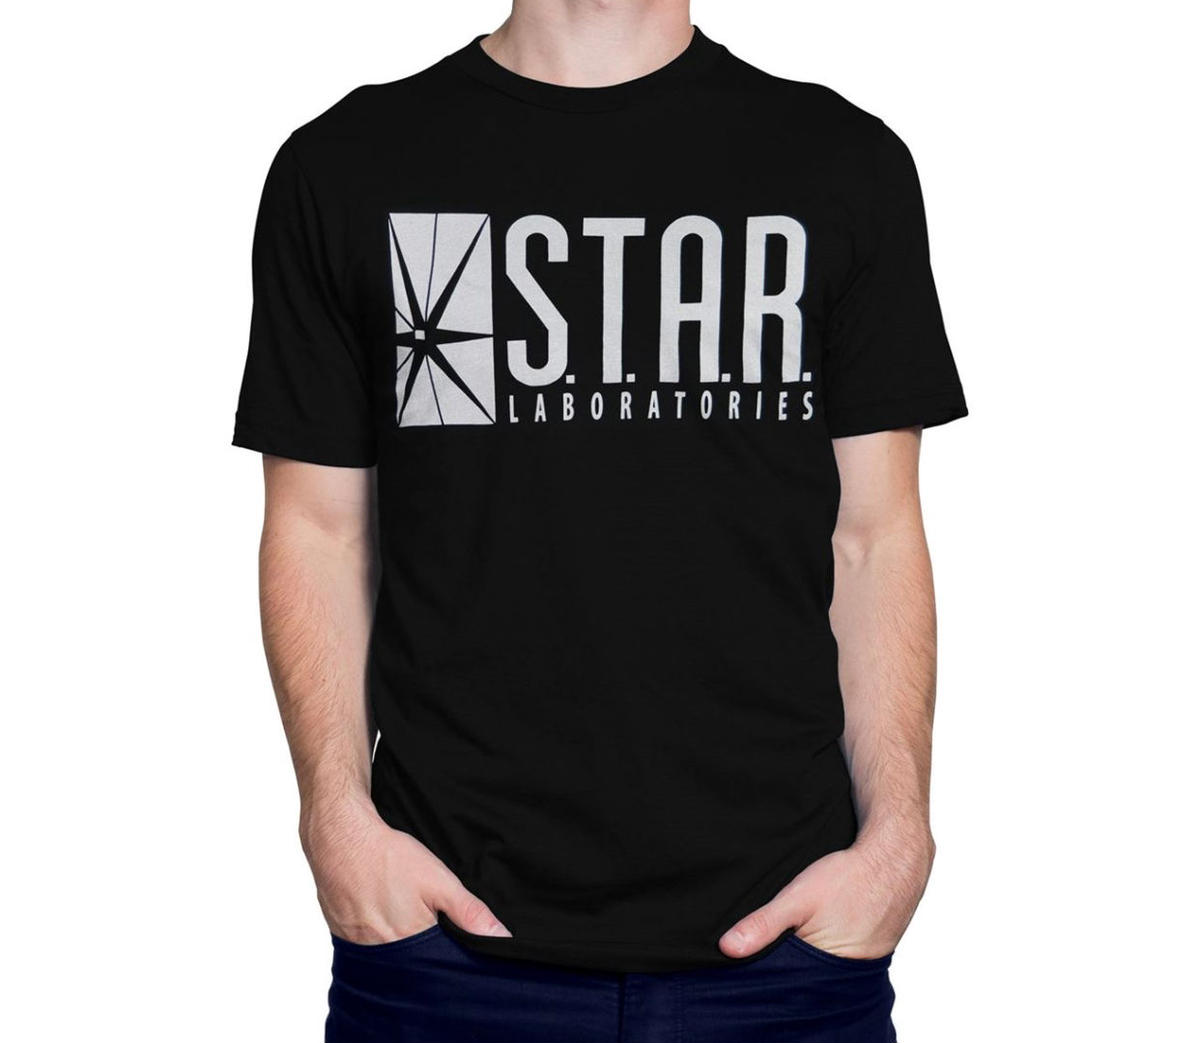 Labs SIZE S STAR LABORATORIES T SHIRT THE FLASH S.T.A.R XXL